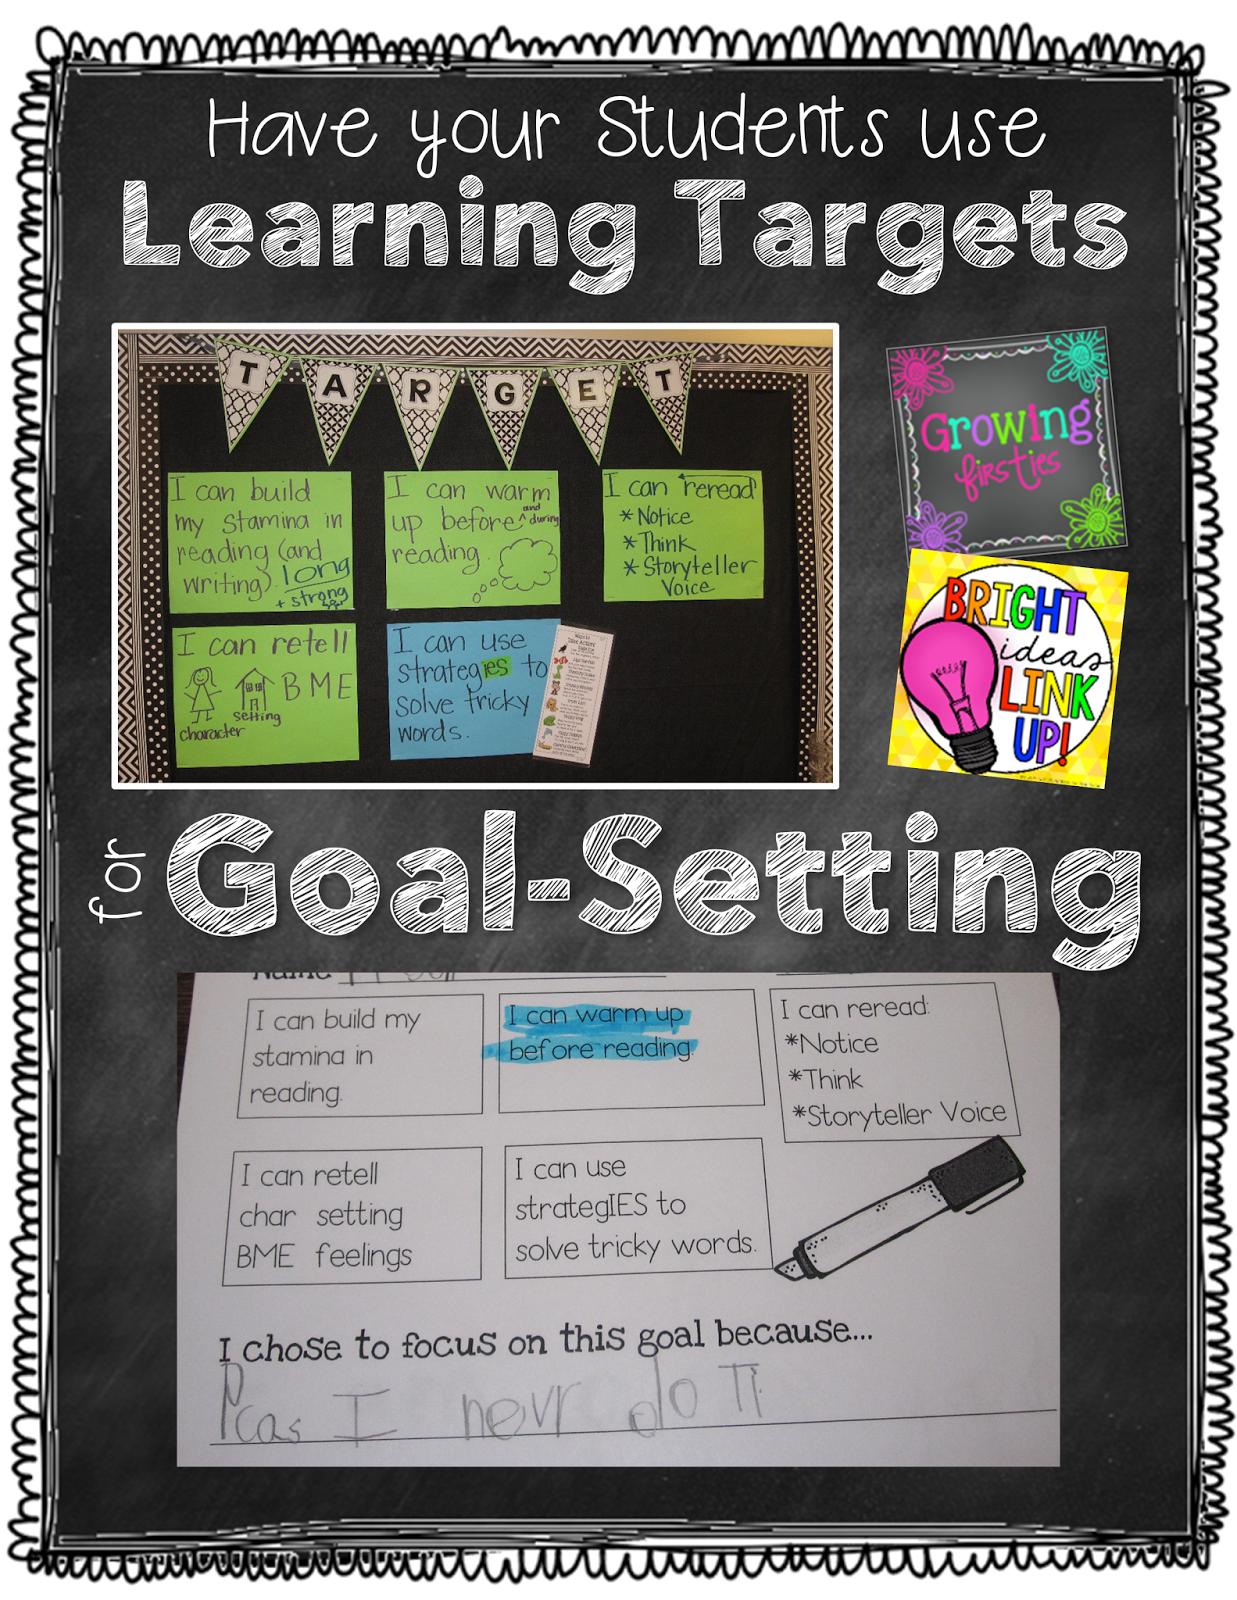 Student Goal Setting Based On Learning Targets